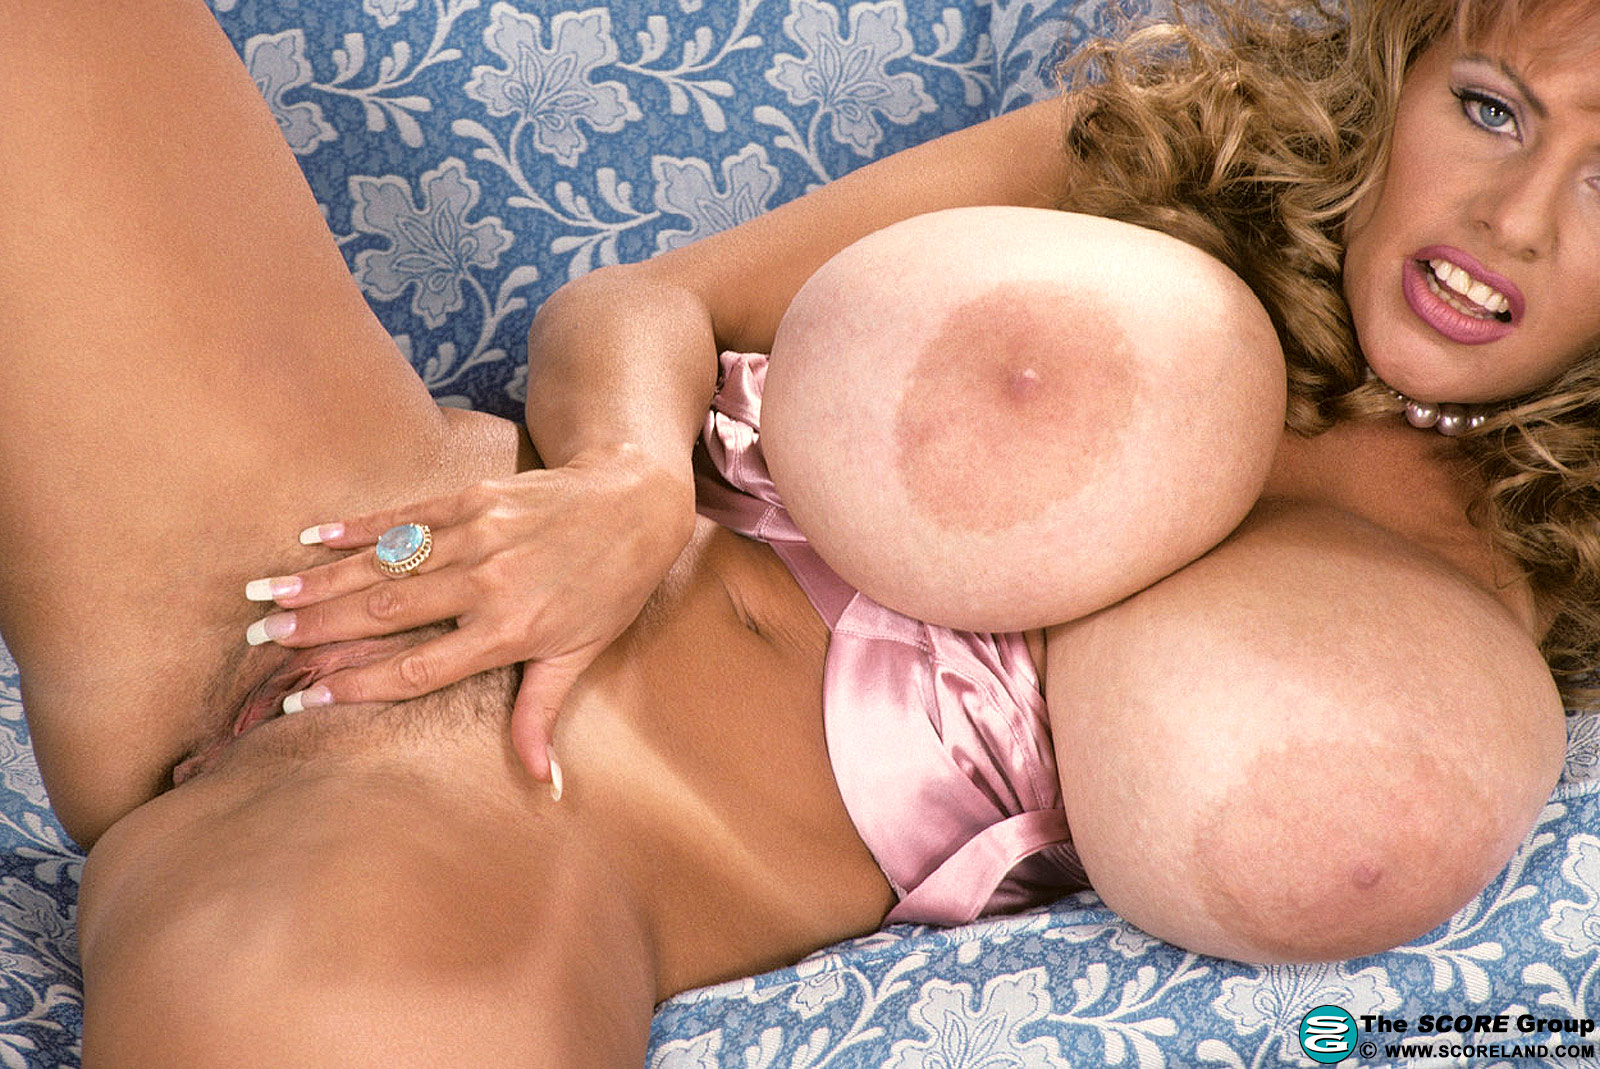 Sexy big boobs legend veronika hot night club striptease 2 1